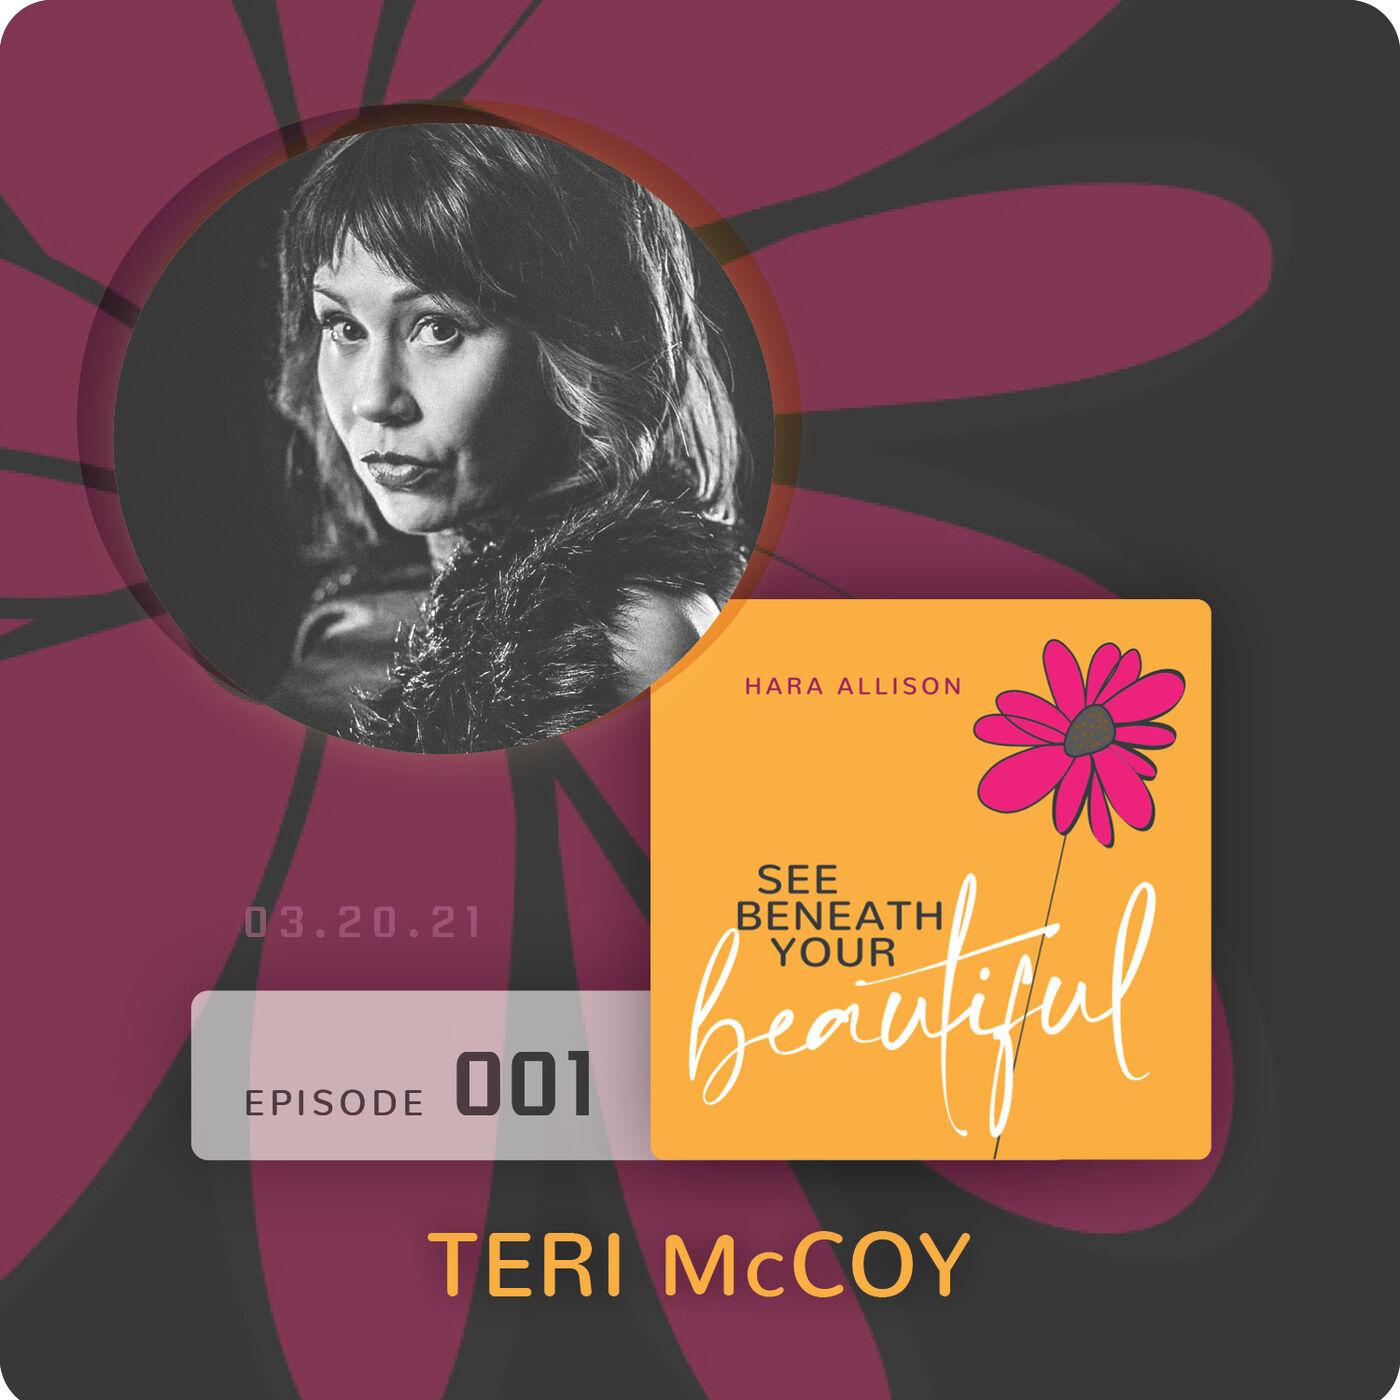 001. Teri McCoy discusses dating and self love